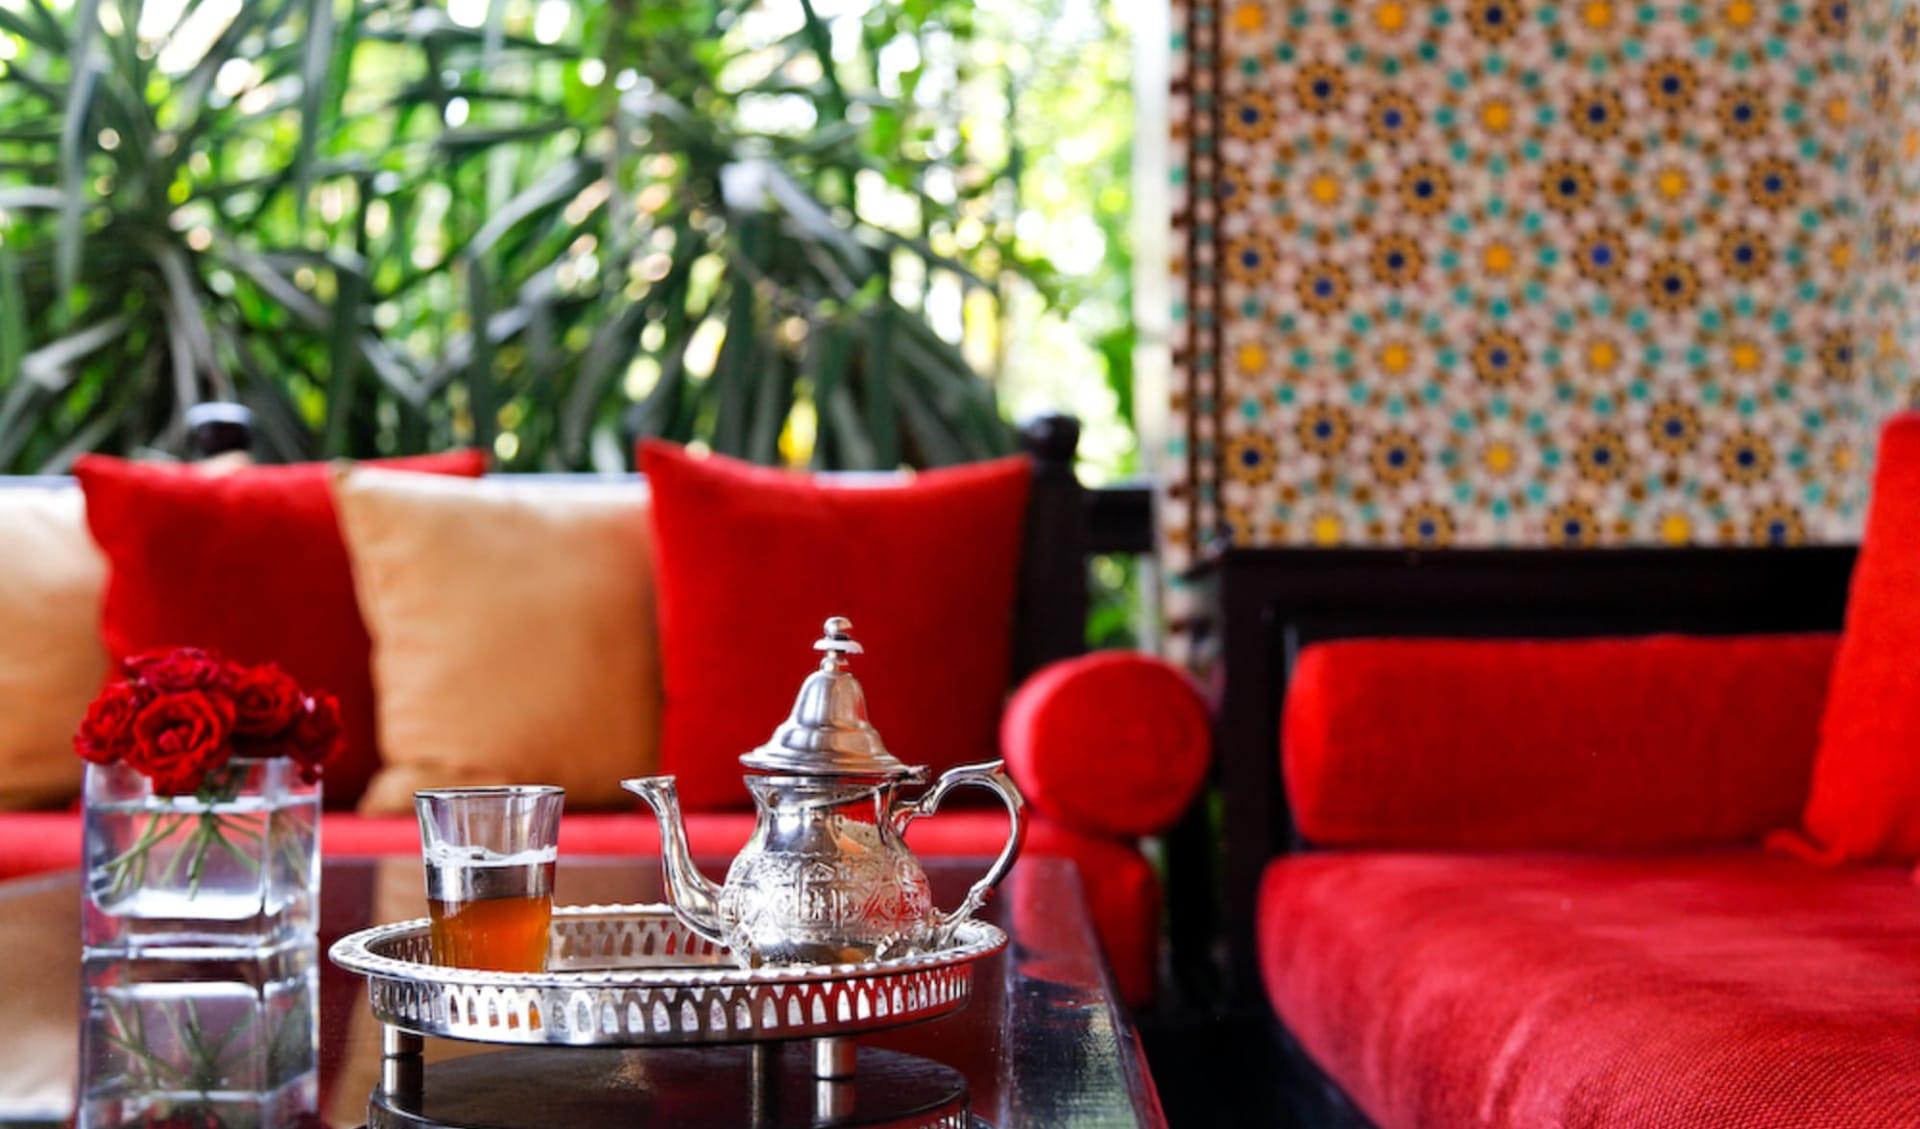 Sofitel Marrakech in Marrakesch: Accueil  Sofitel Marrakech Palais Imperial 1 (2)